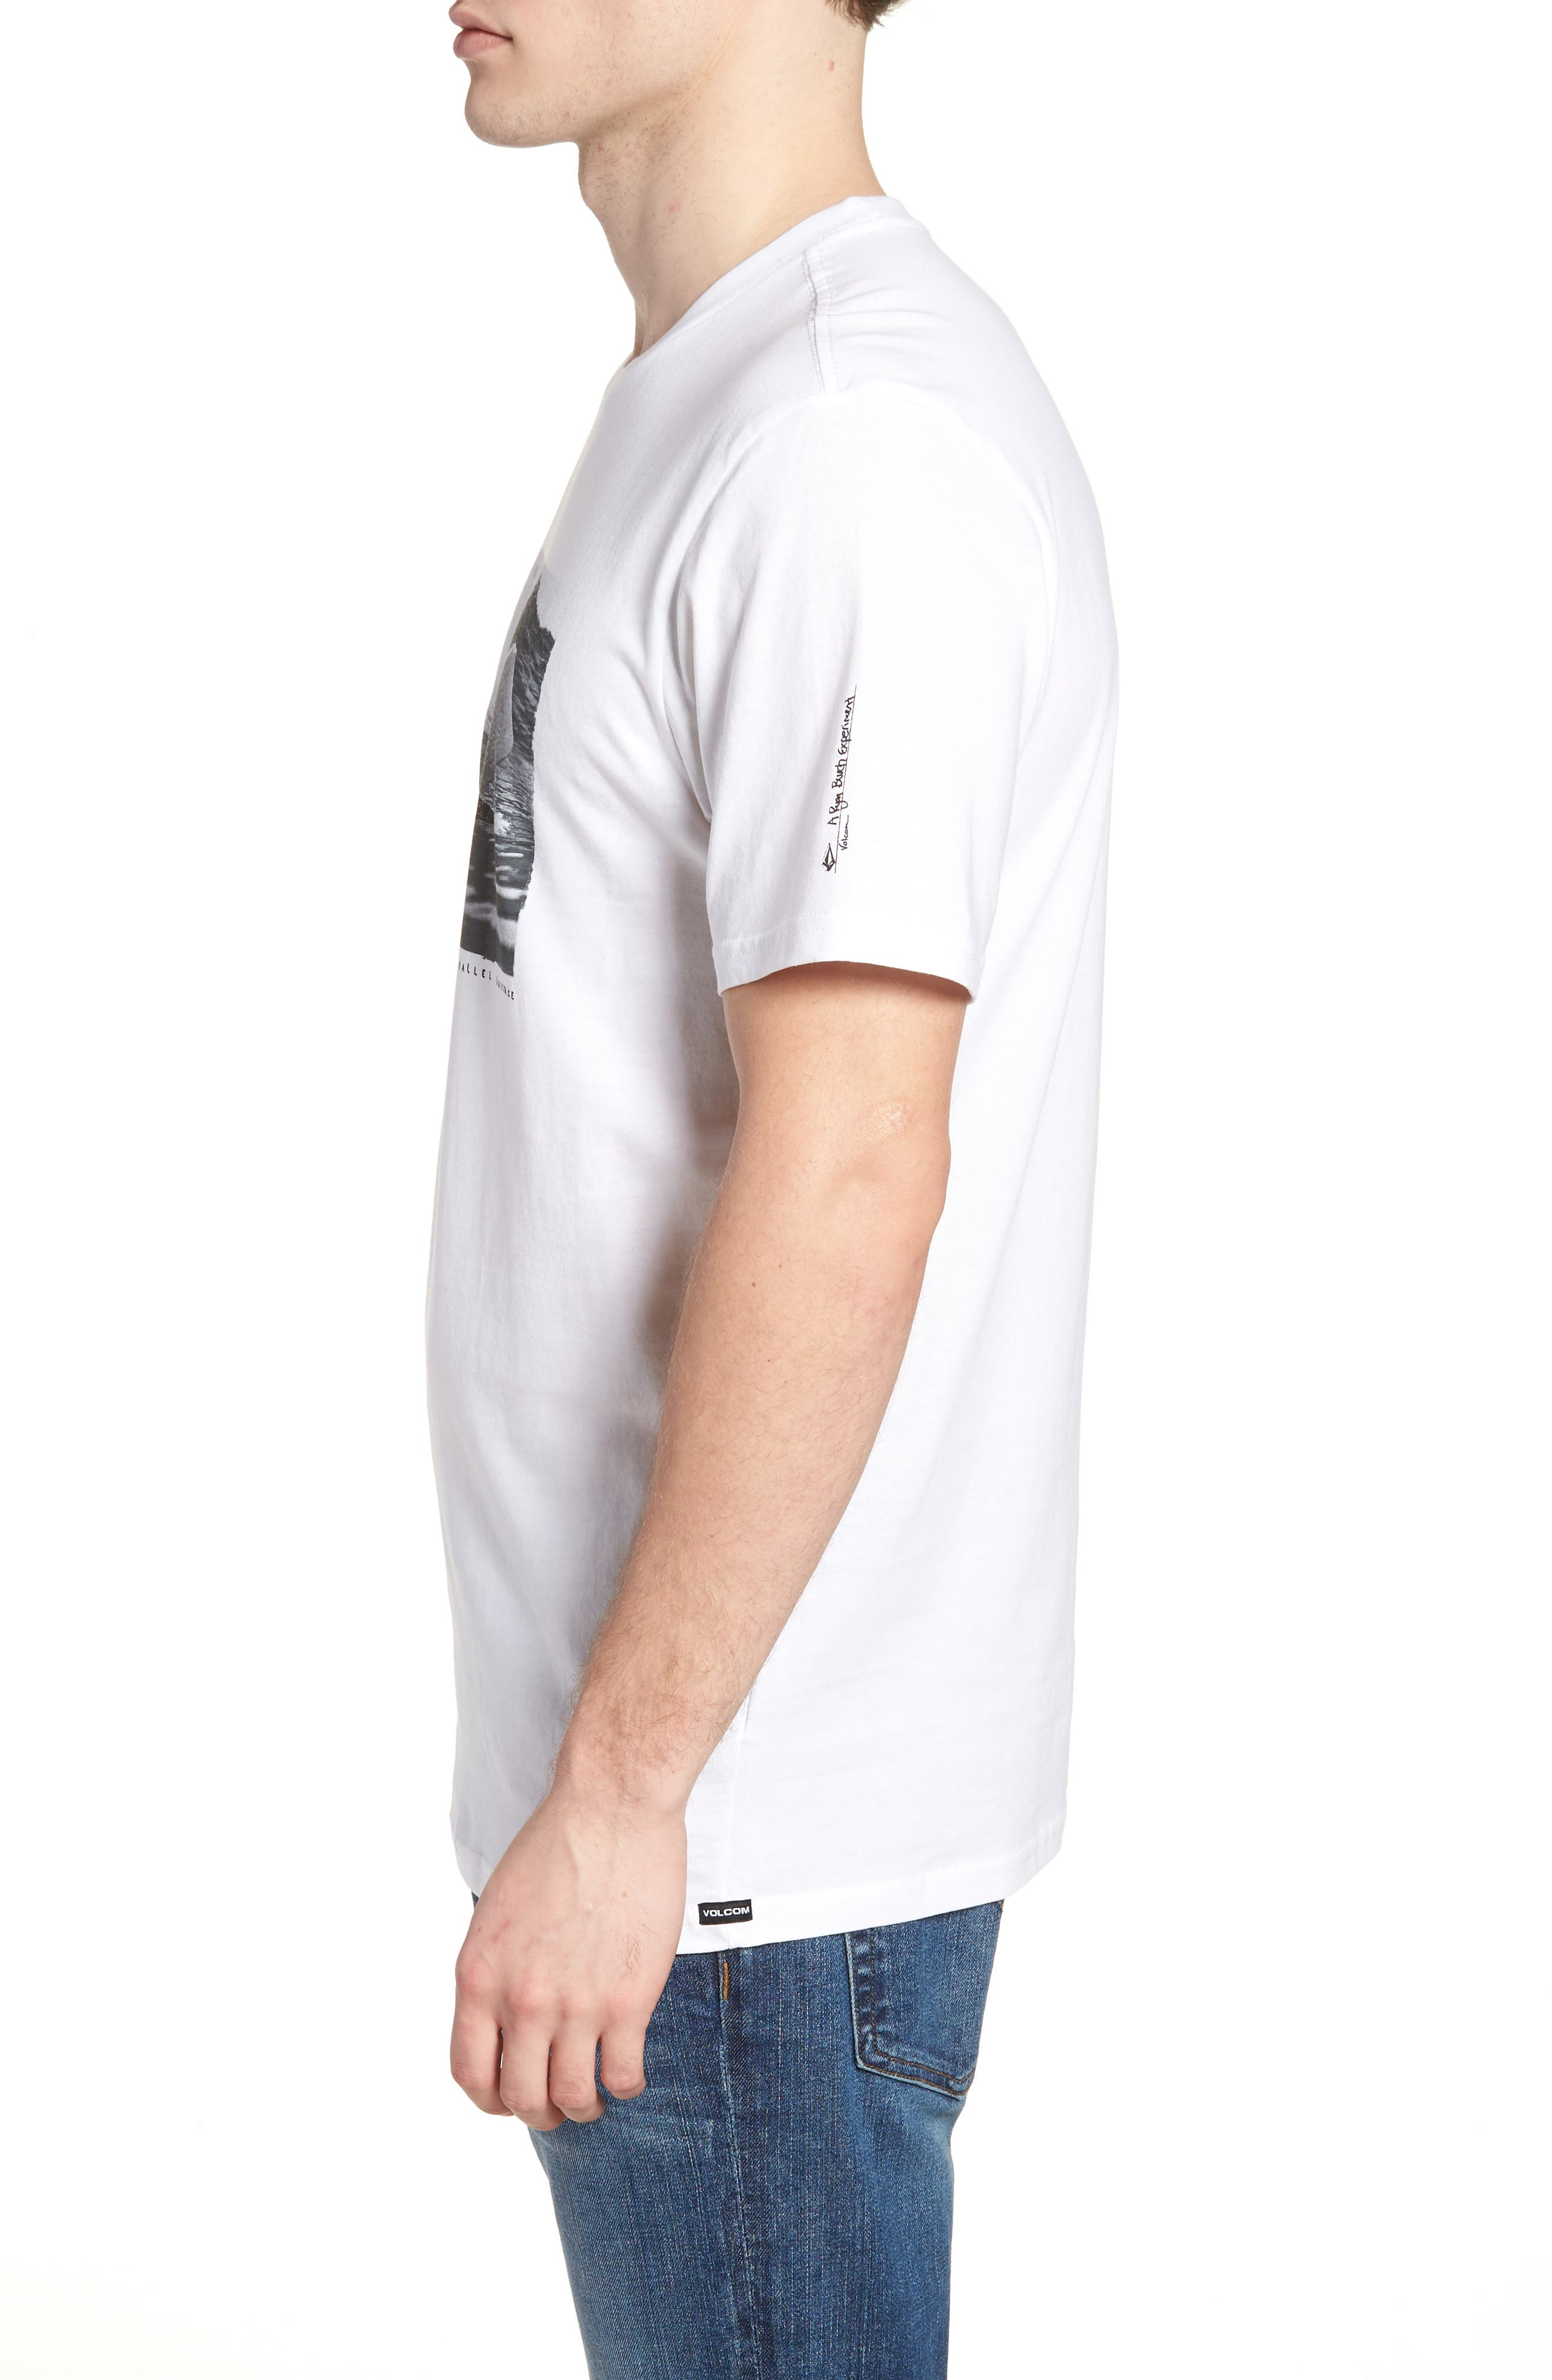 Burch Foam Graphic T-Shirt,                             Alternate thumbnail 3, color,                             White